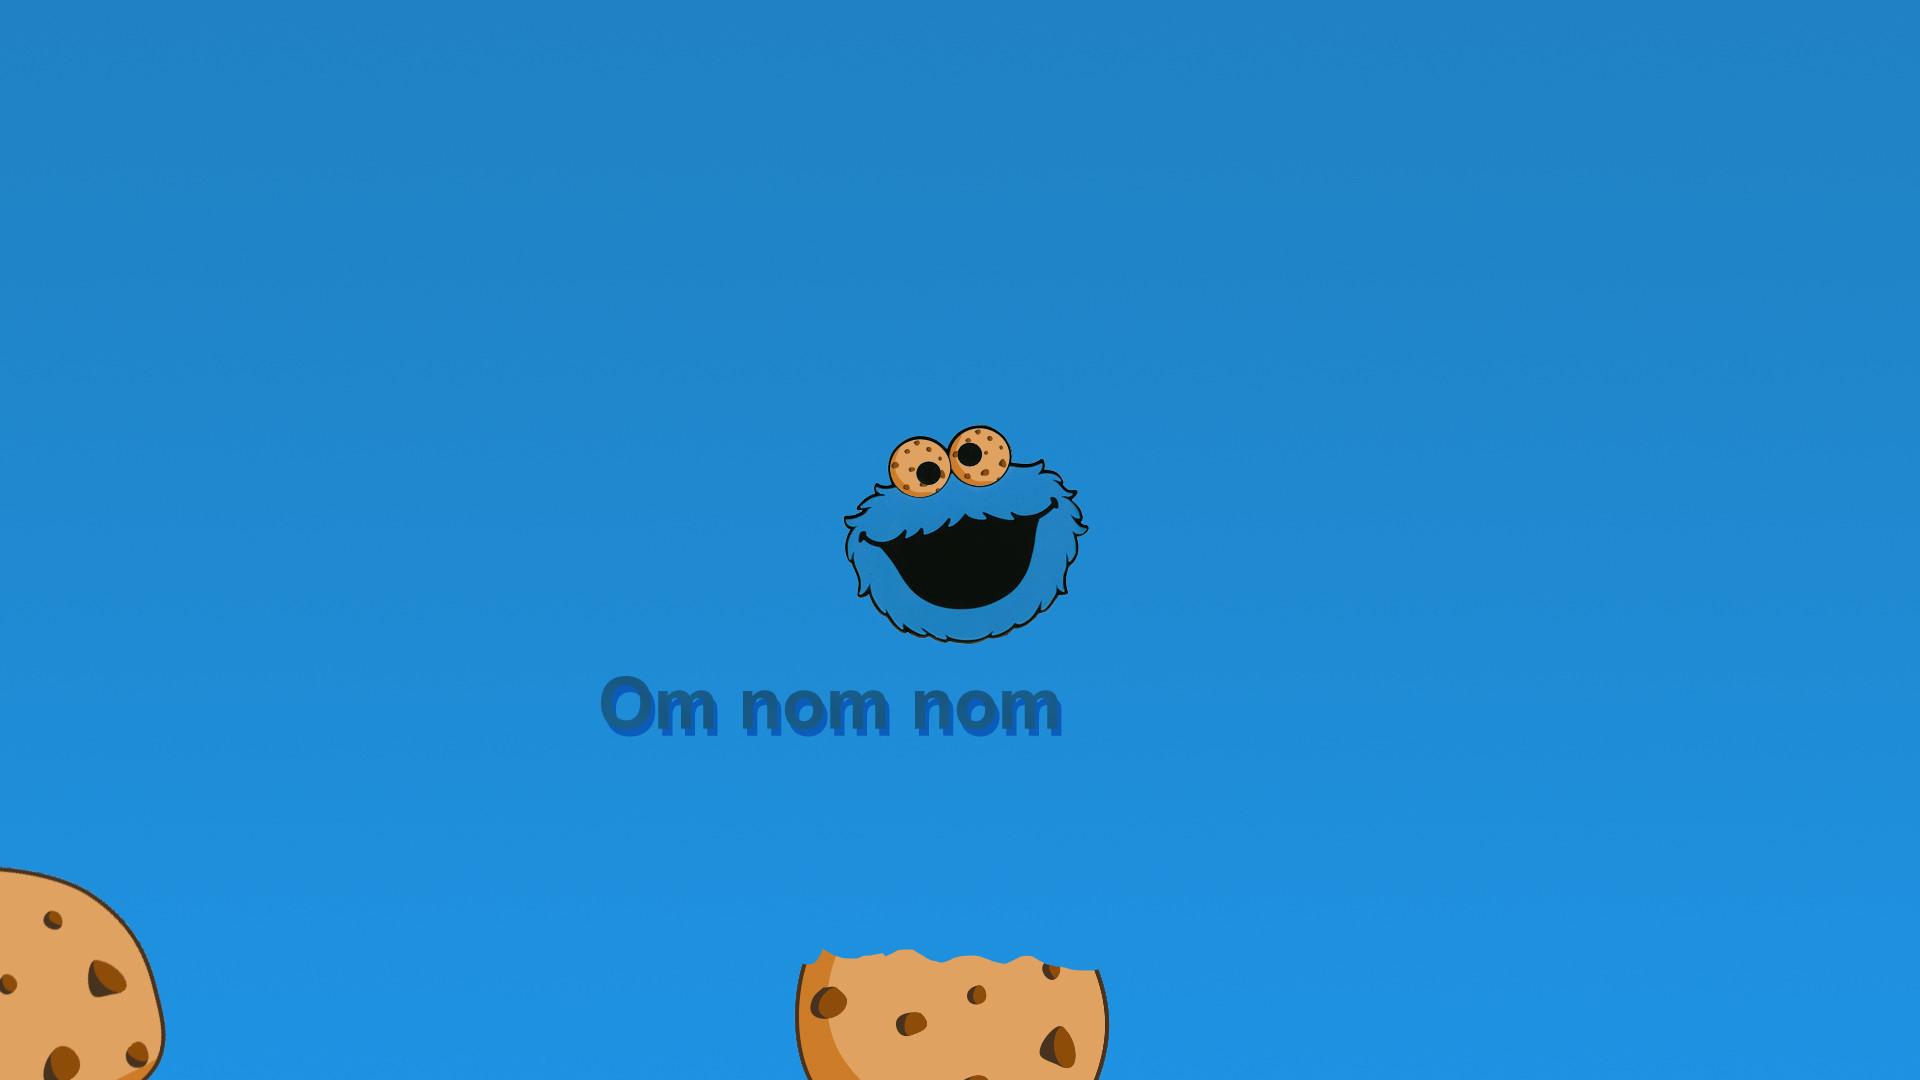 Tumblr Cute Iphone 5 Screensaver: Cute Cookie Monster Iphone Wallpaper Cute Cookie Monster